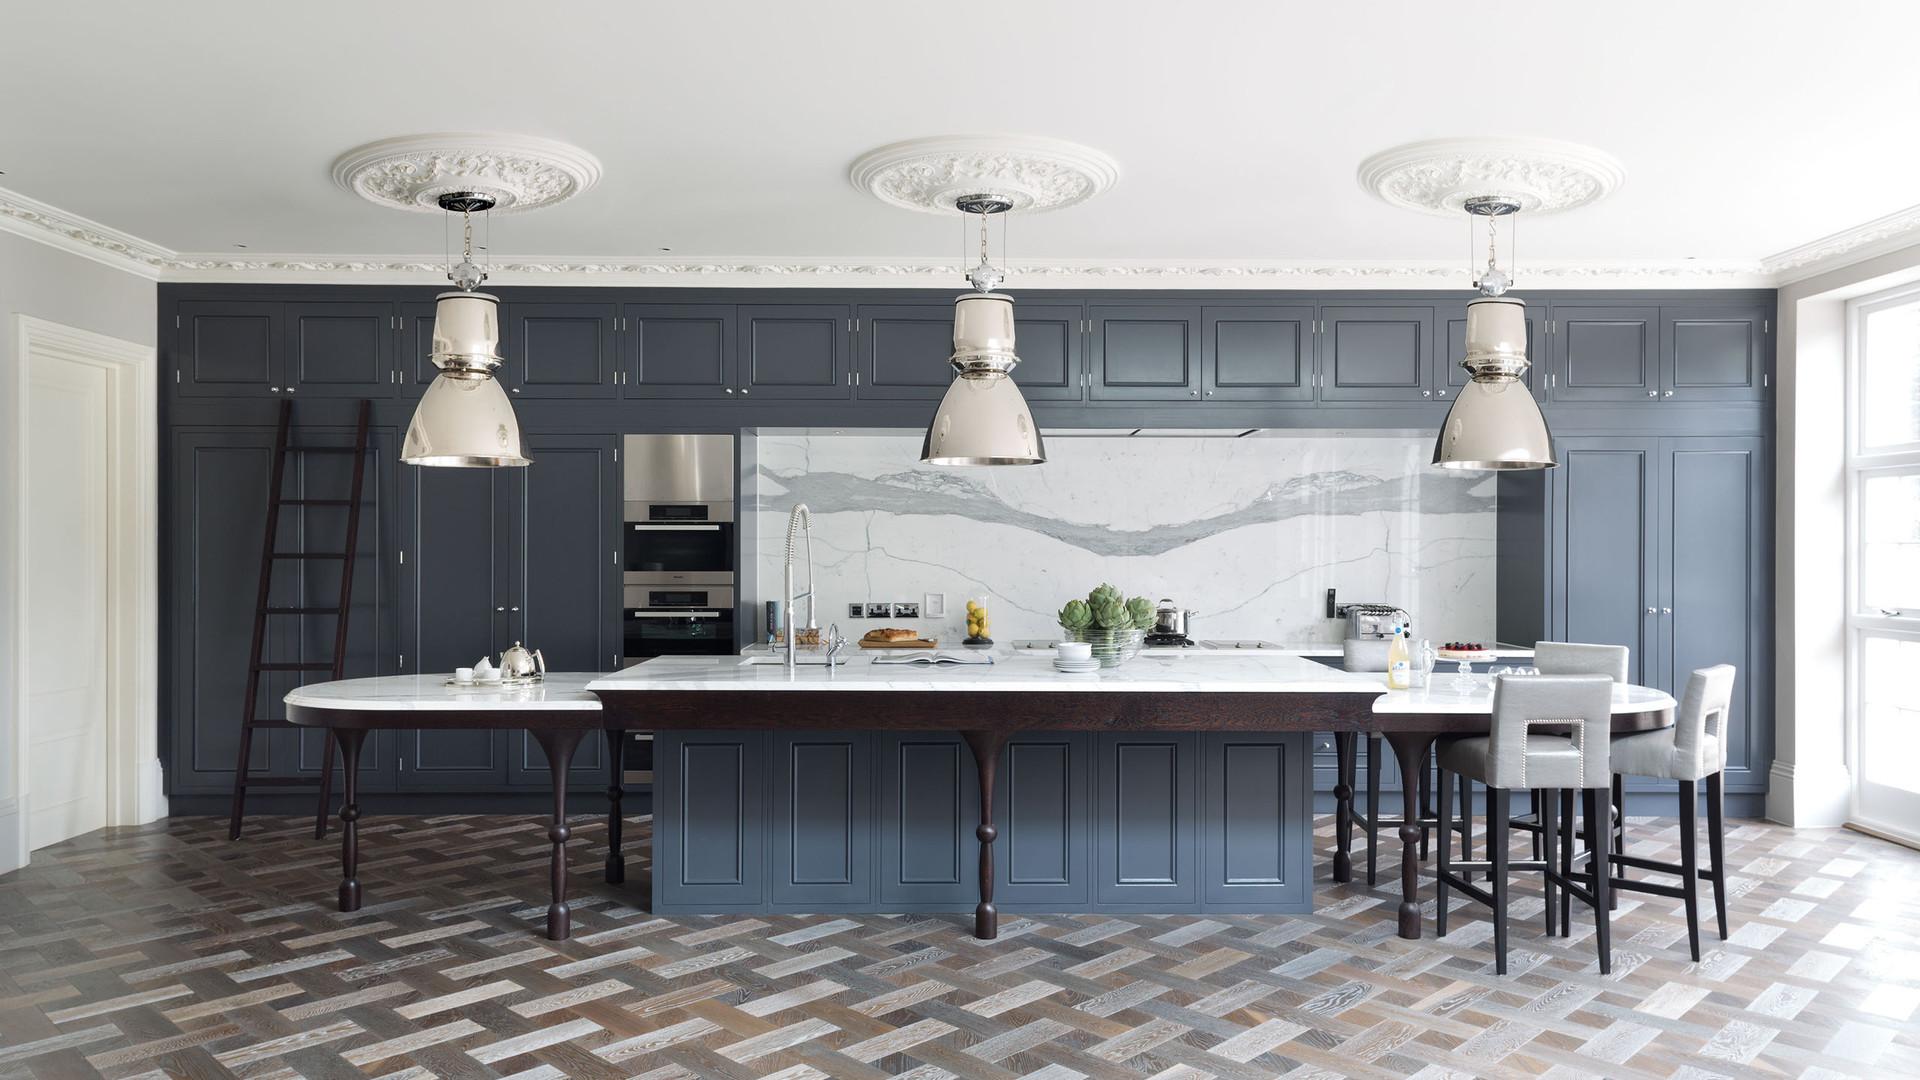 Knightsbridge Design - Interior 28